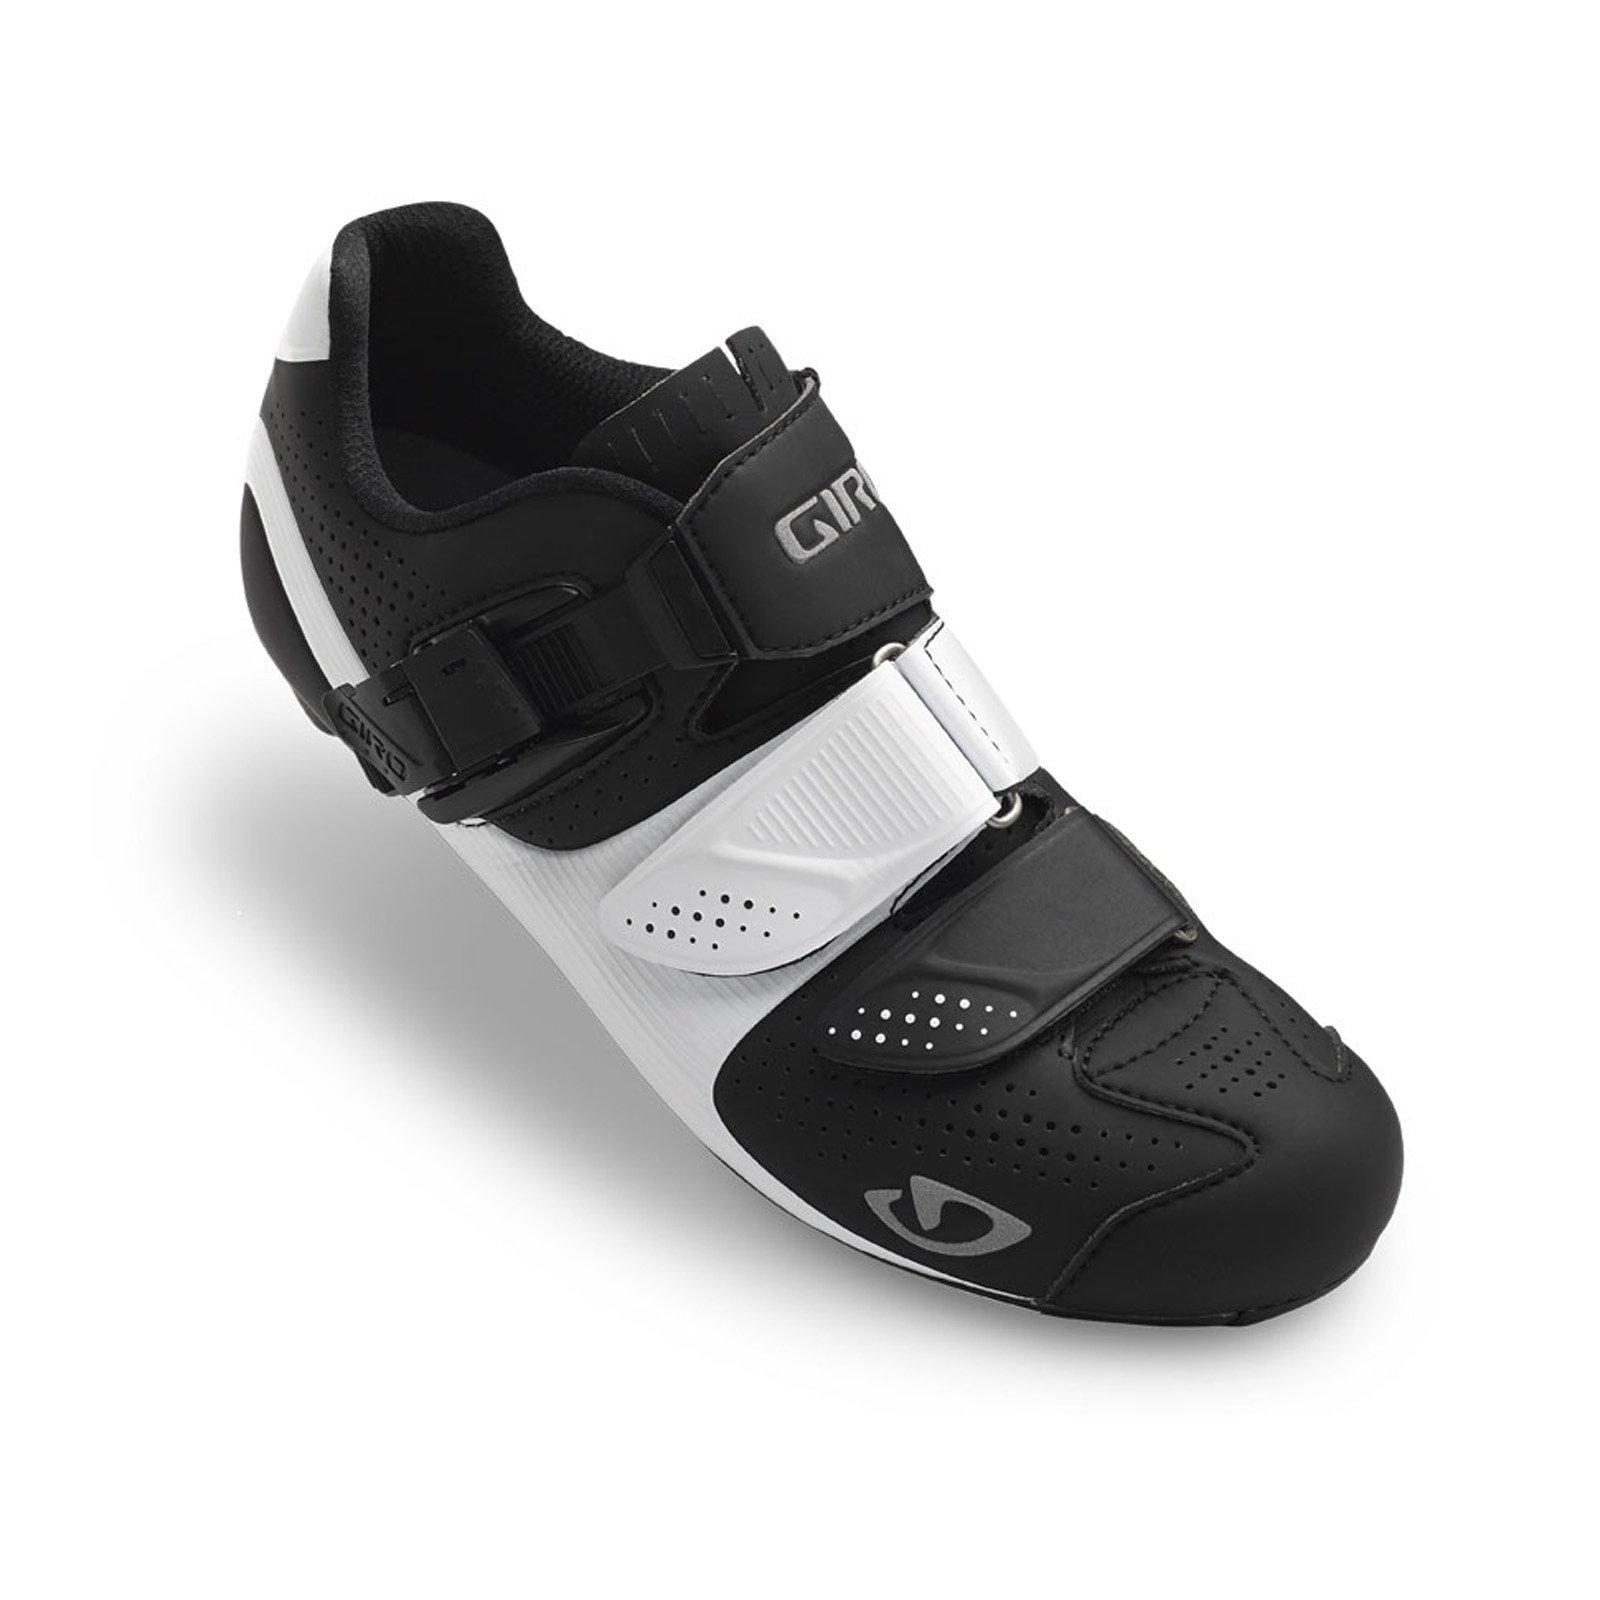 Giro Factress ACC Shoes - Women's Matte Black/White, 38.5